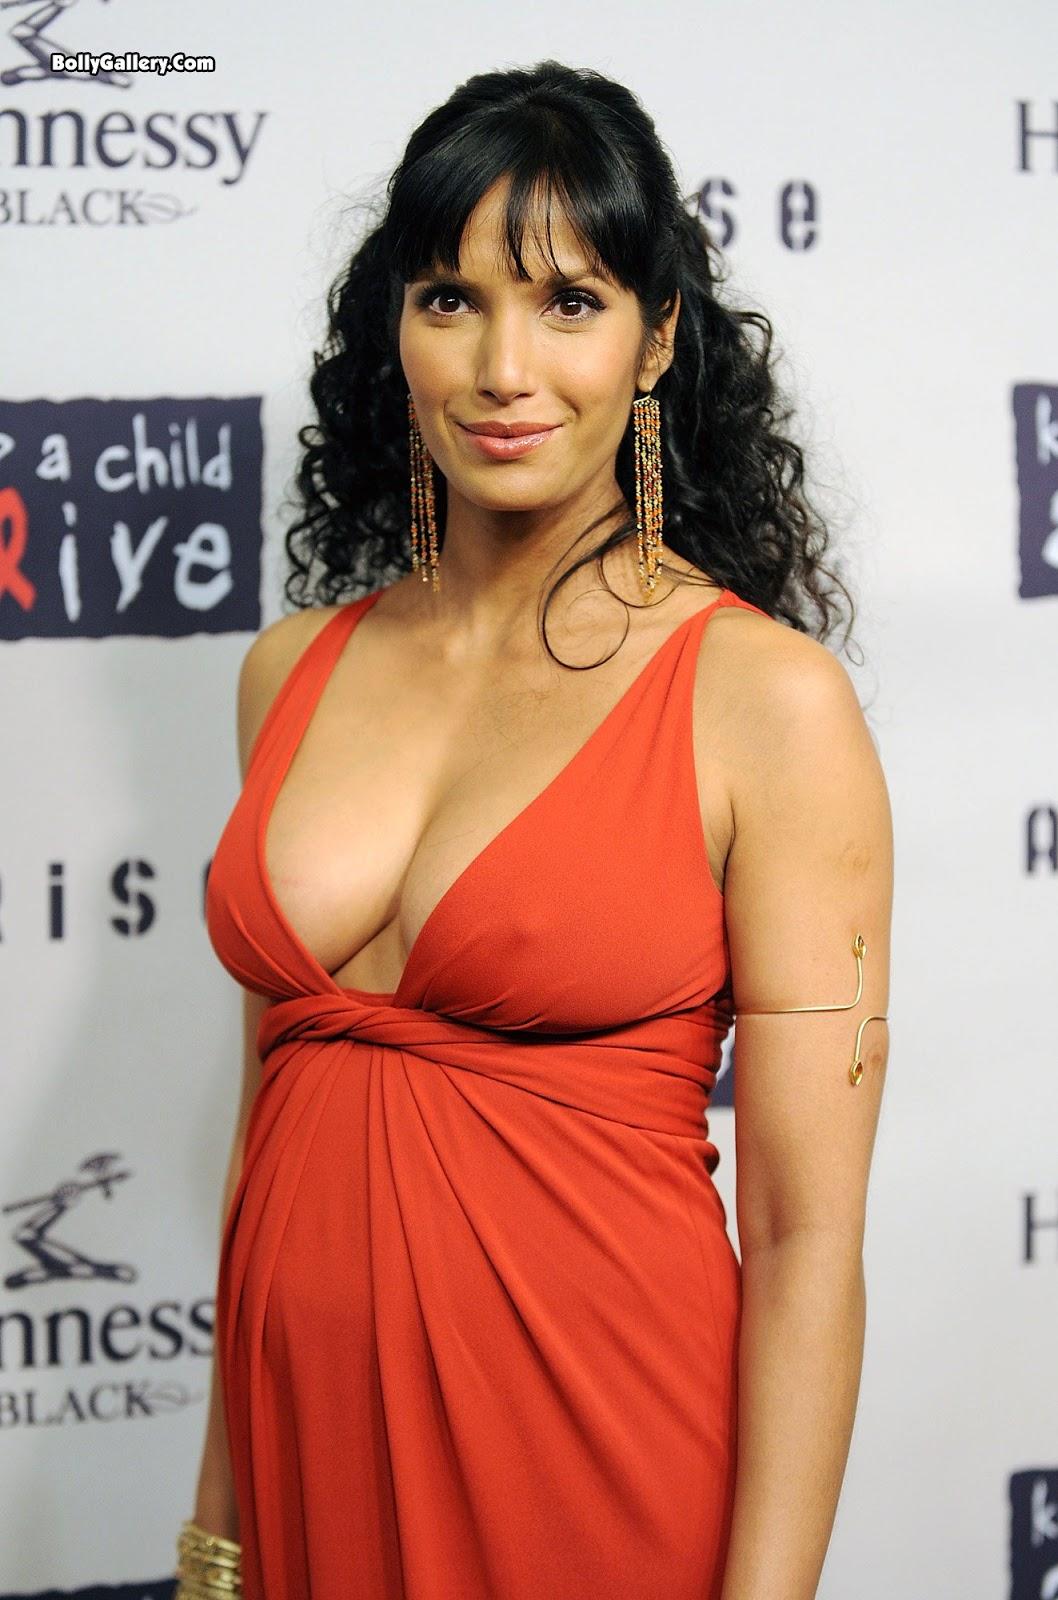 Cleavage Padma Lakshmi naked (46 photo), Tits, Fappening, Twitter, bra 2015